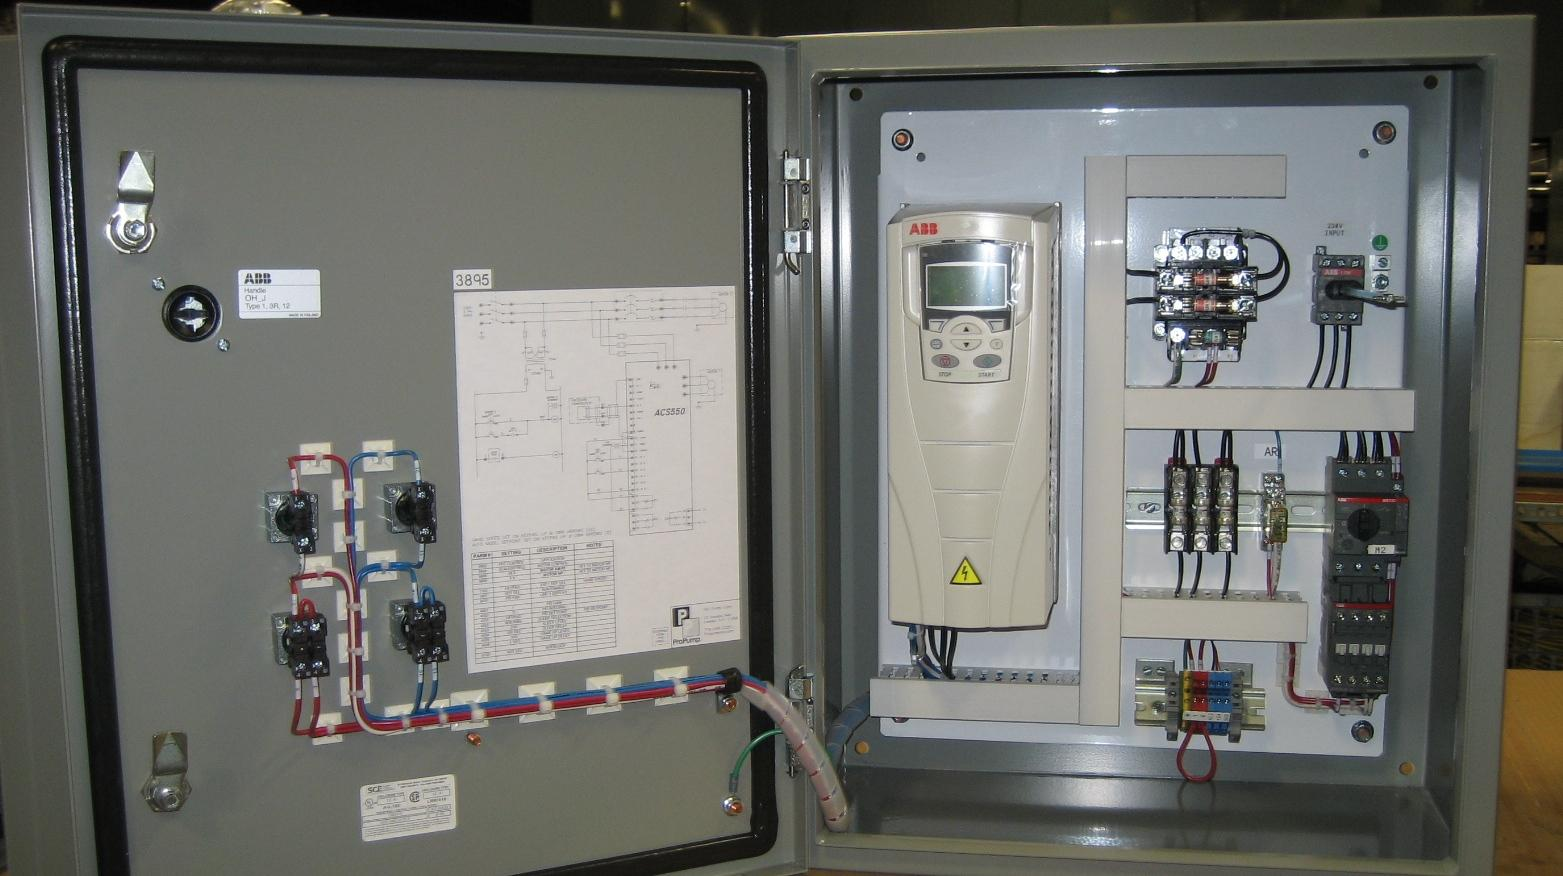 duplex pump control panel wiring diagram 2002 f150 trailer motors wire elsavadorla